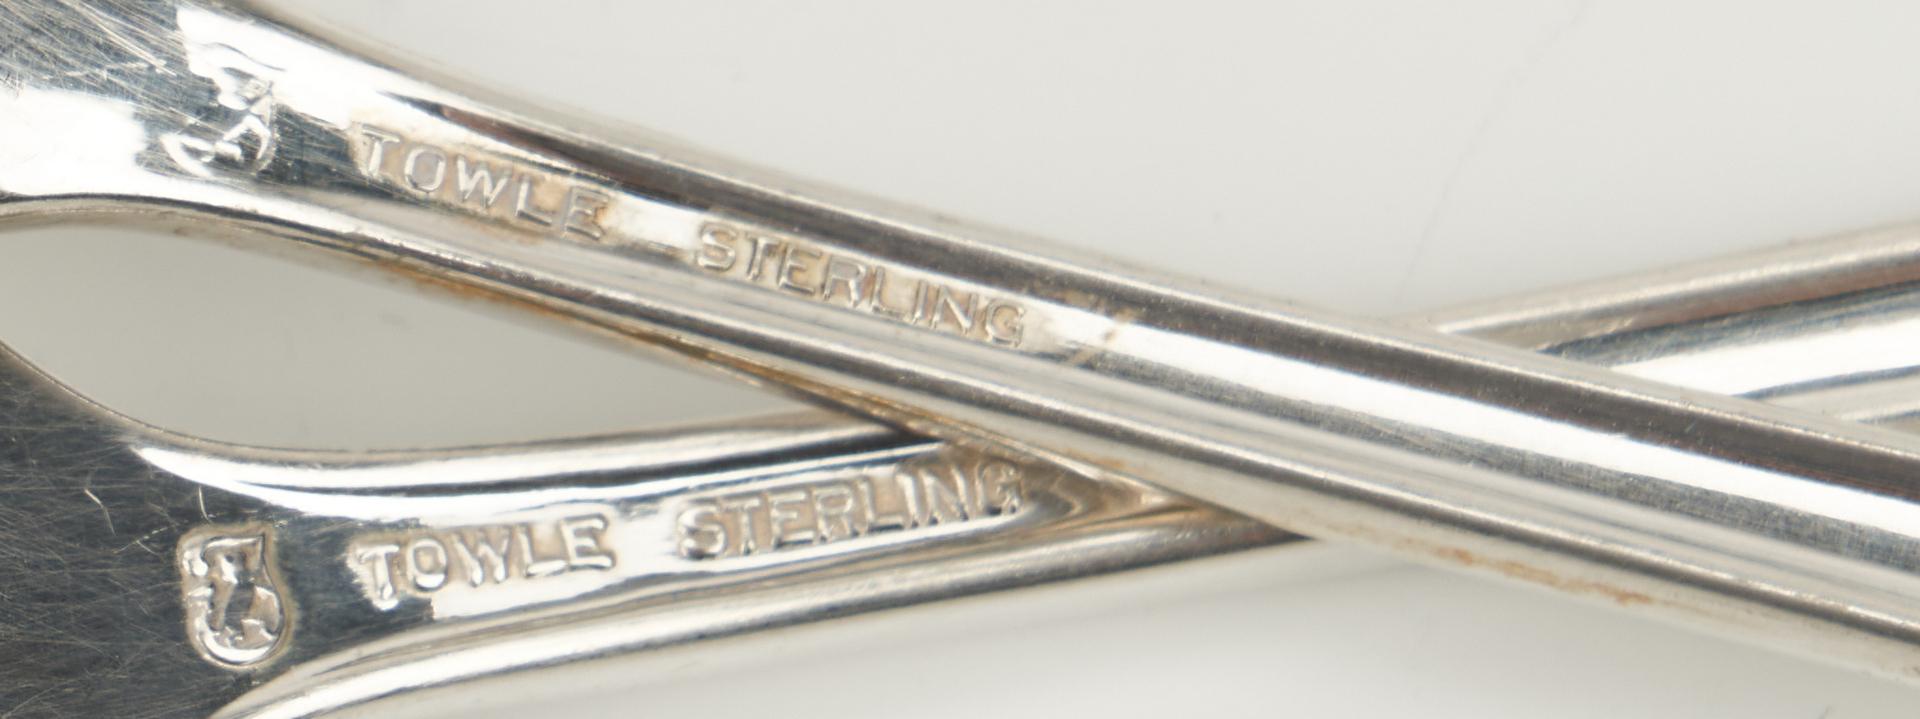 Lot 452: 45 pcs. Sterling Flatware, incl. Towle Chippendale